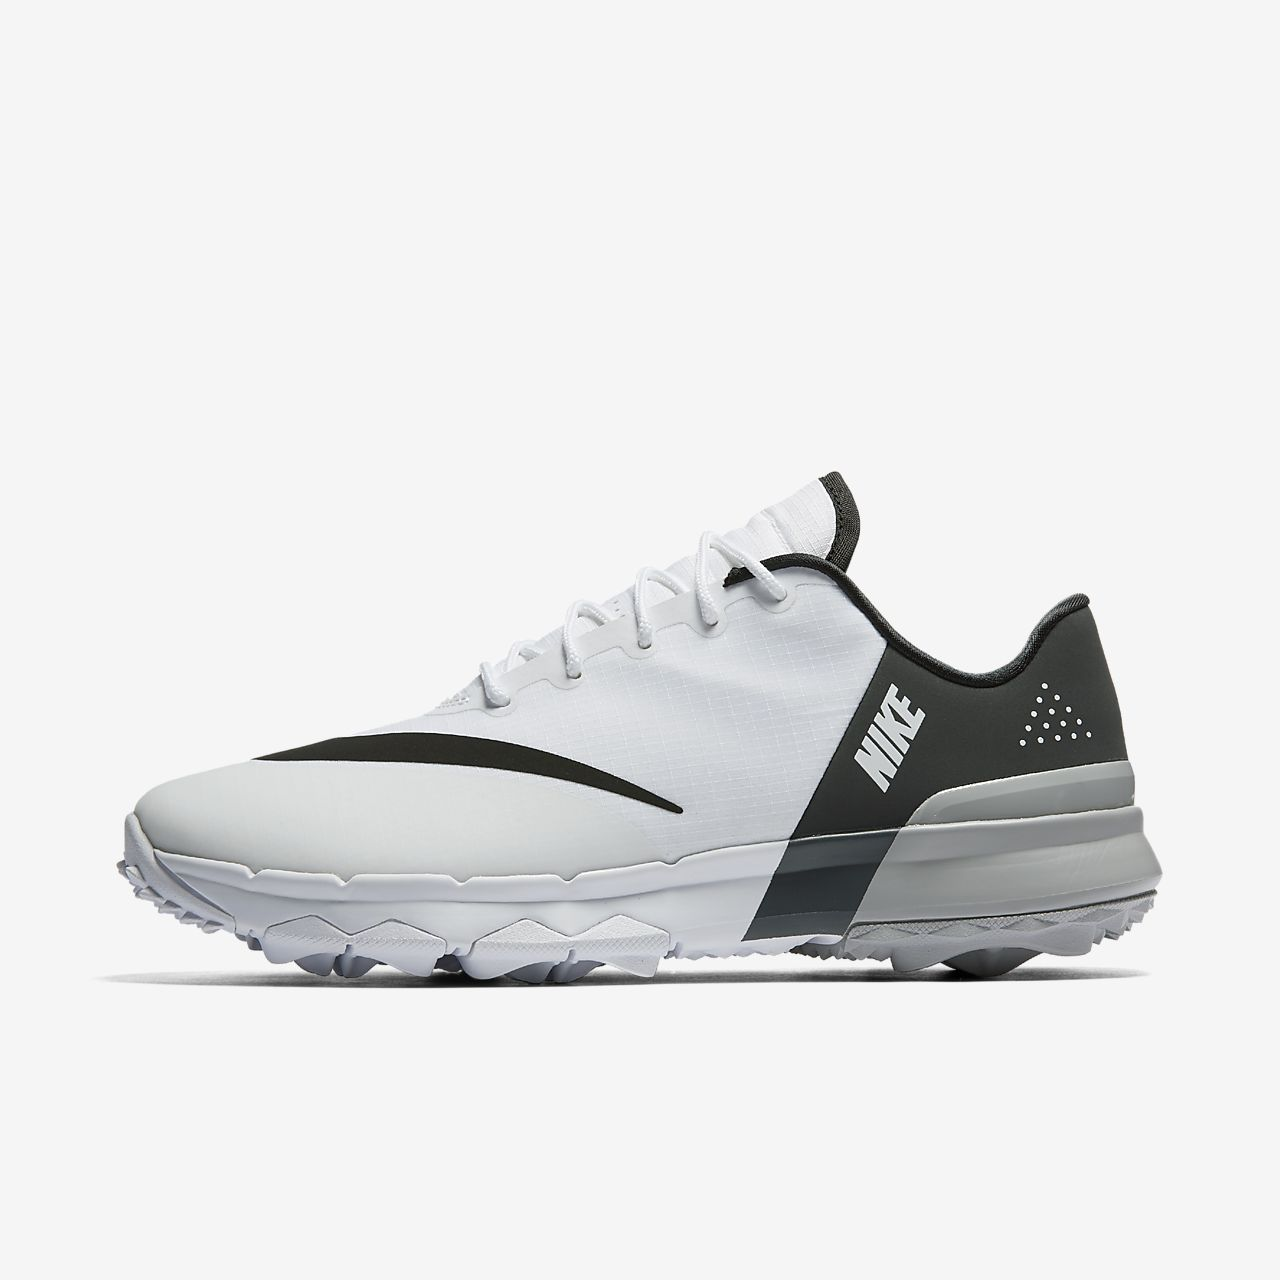 Nike FI Flex Mens Golf Shoe Black/White-Anthracite 12